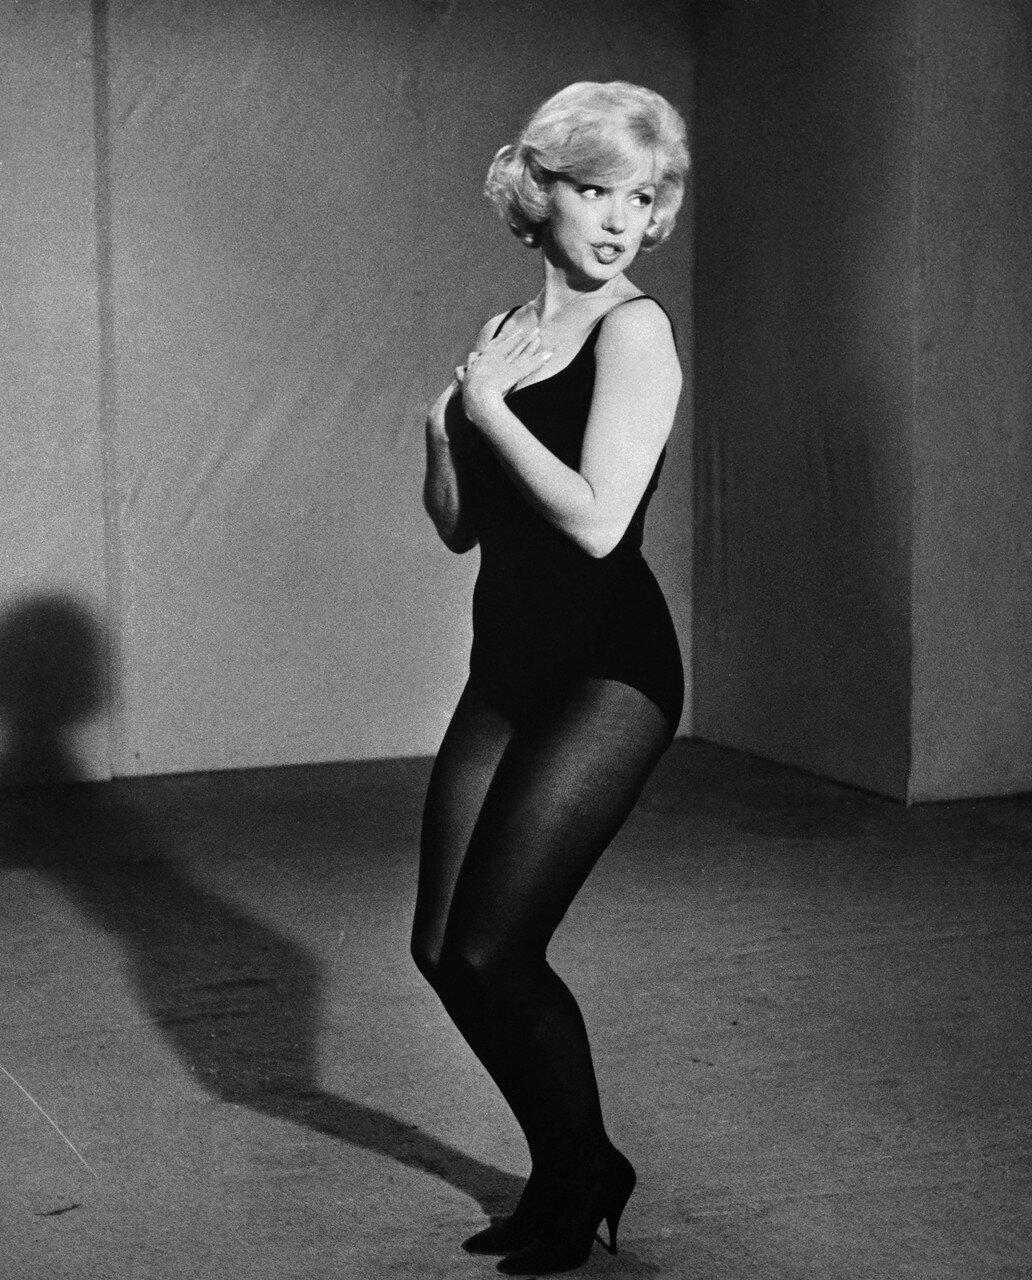 Marilyn Monroe Rehearsing in Leotard